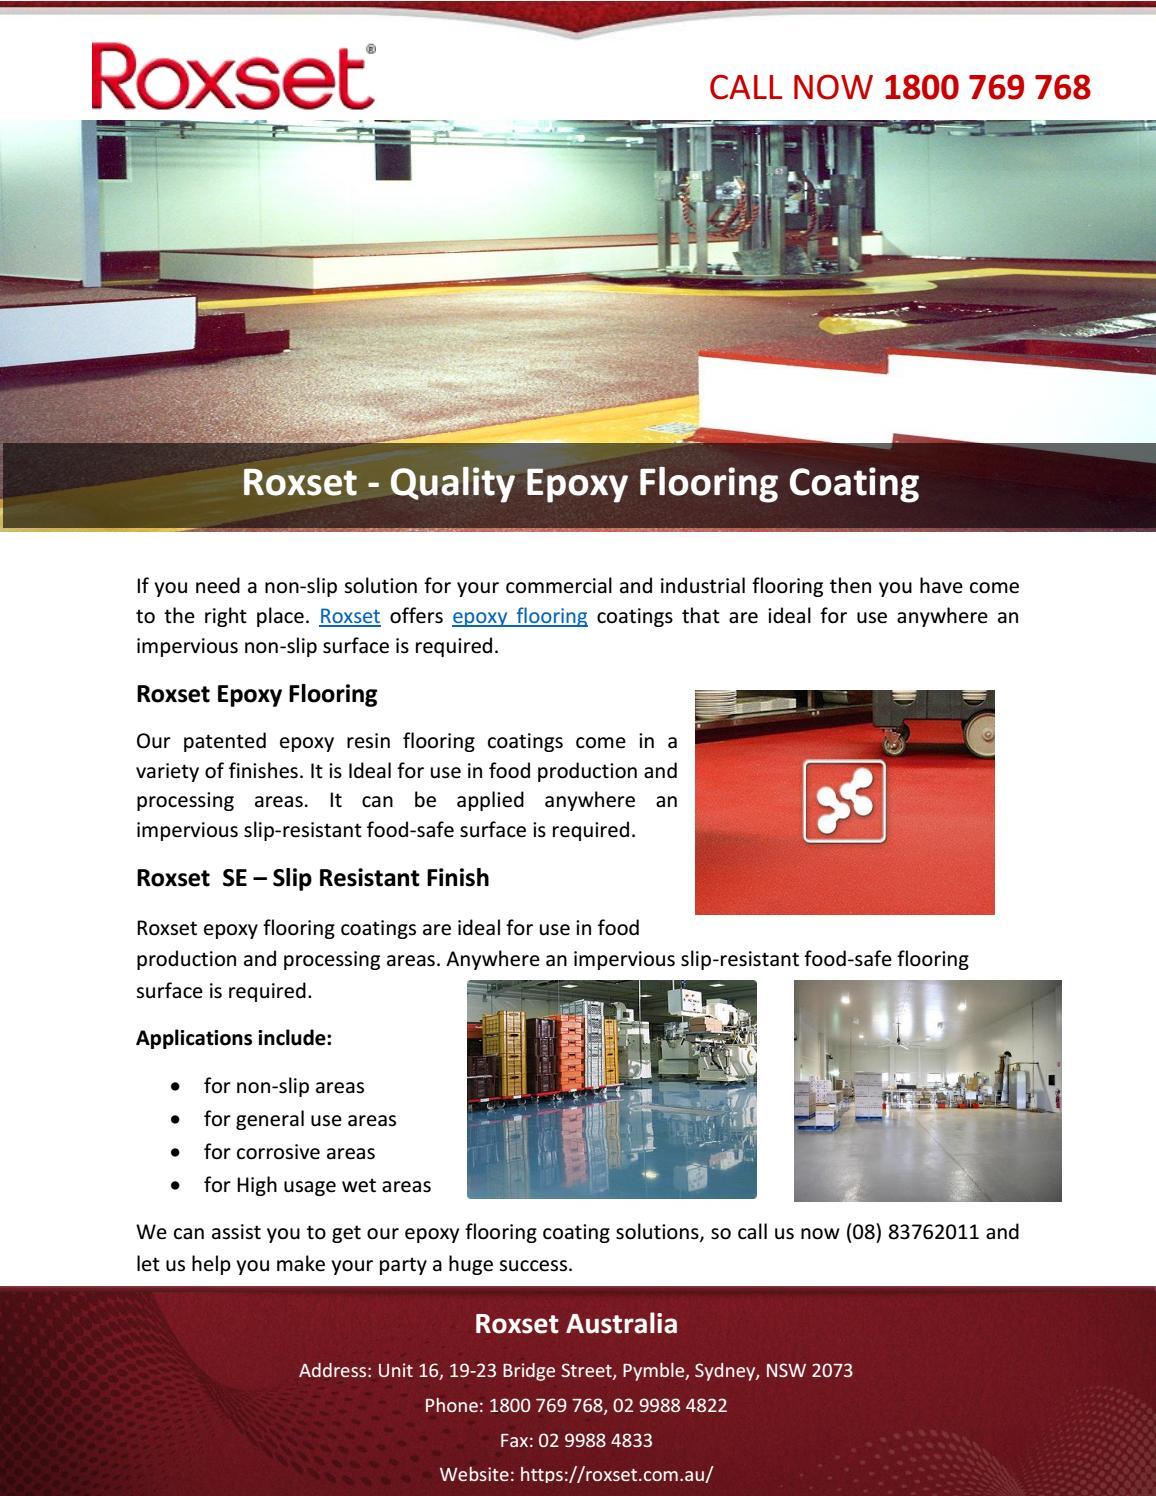 Roxset - Quality Epoxy Flooring Coating by RoxsetAustralia - issuu